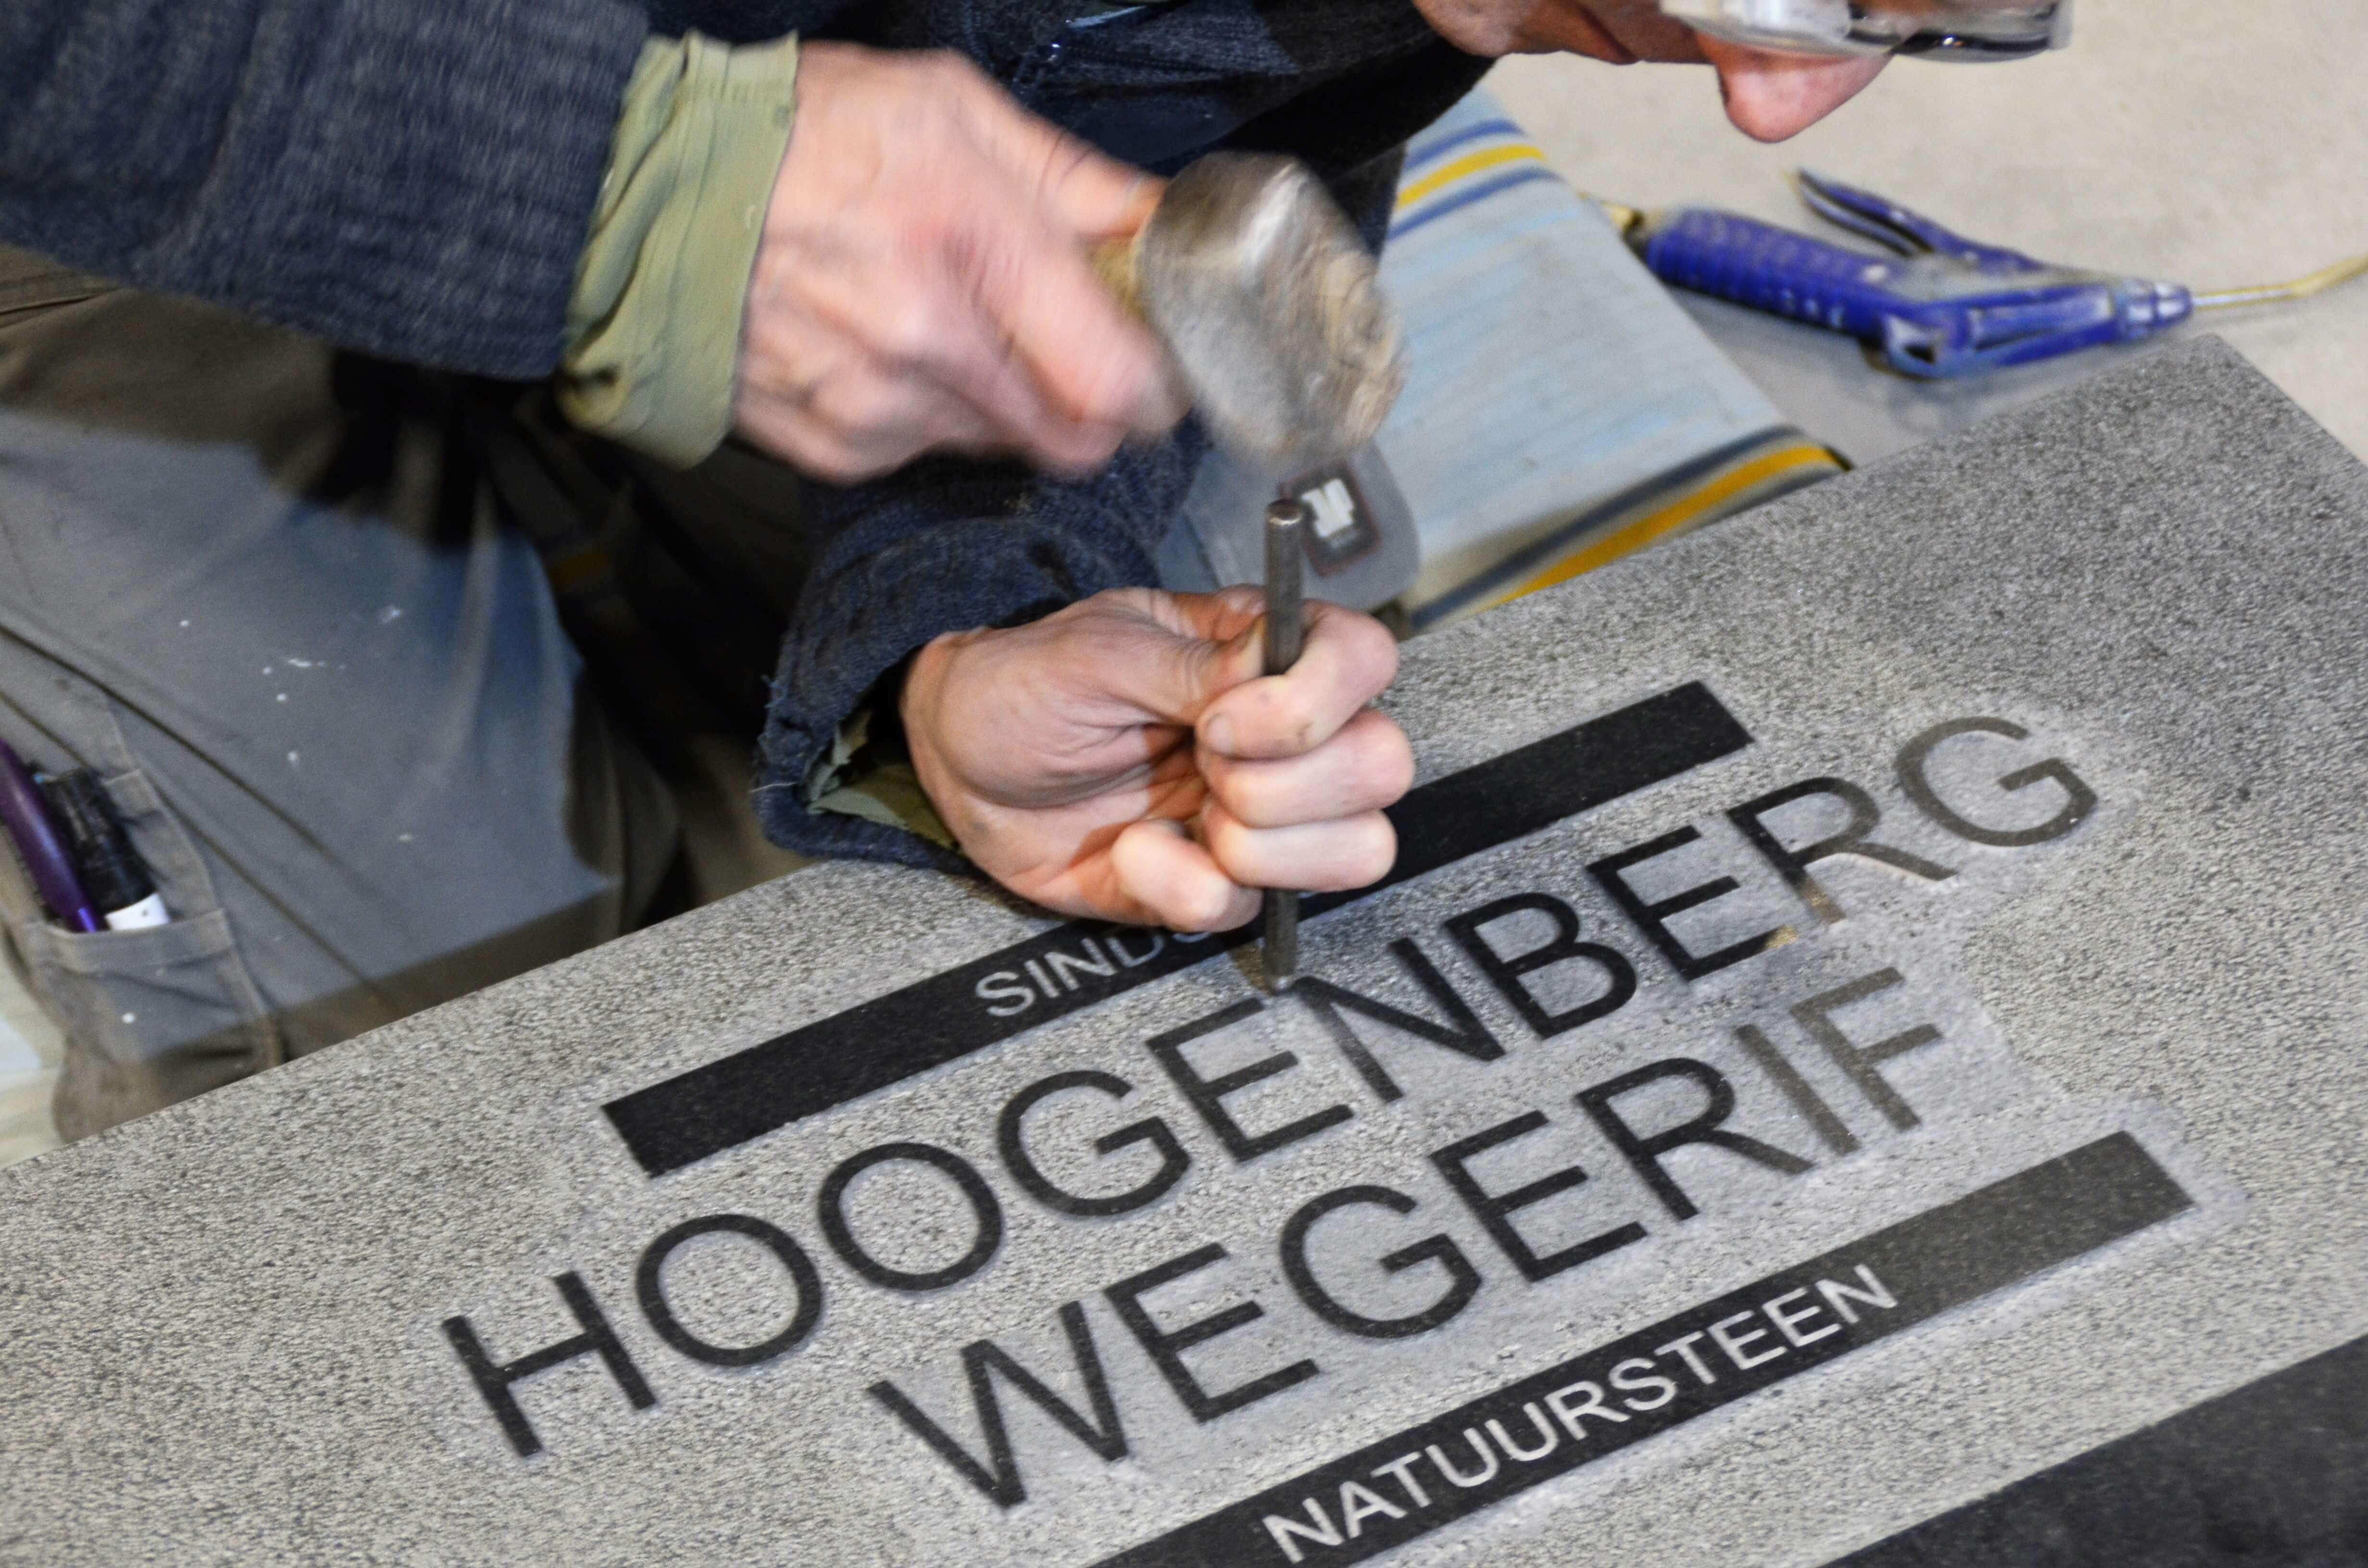 Werkplaats Hoogenberg-Wegerif